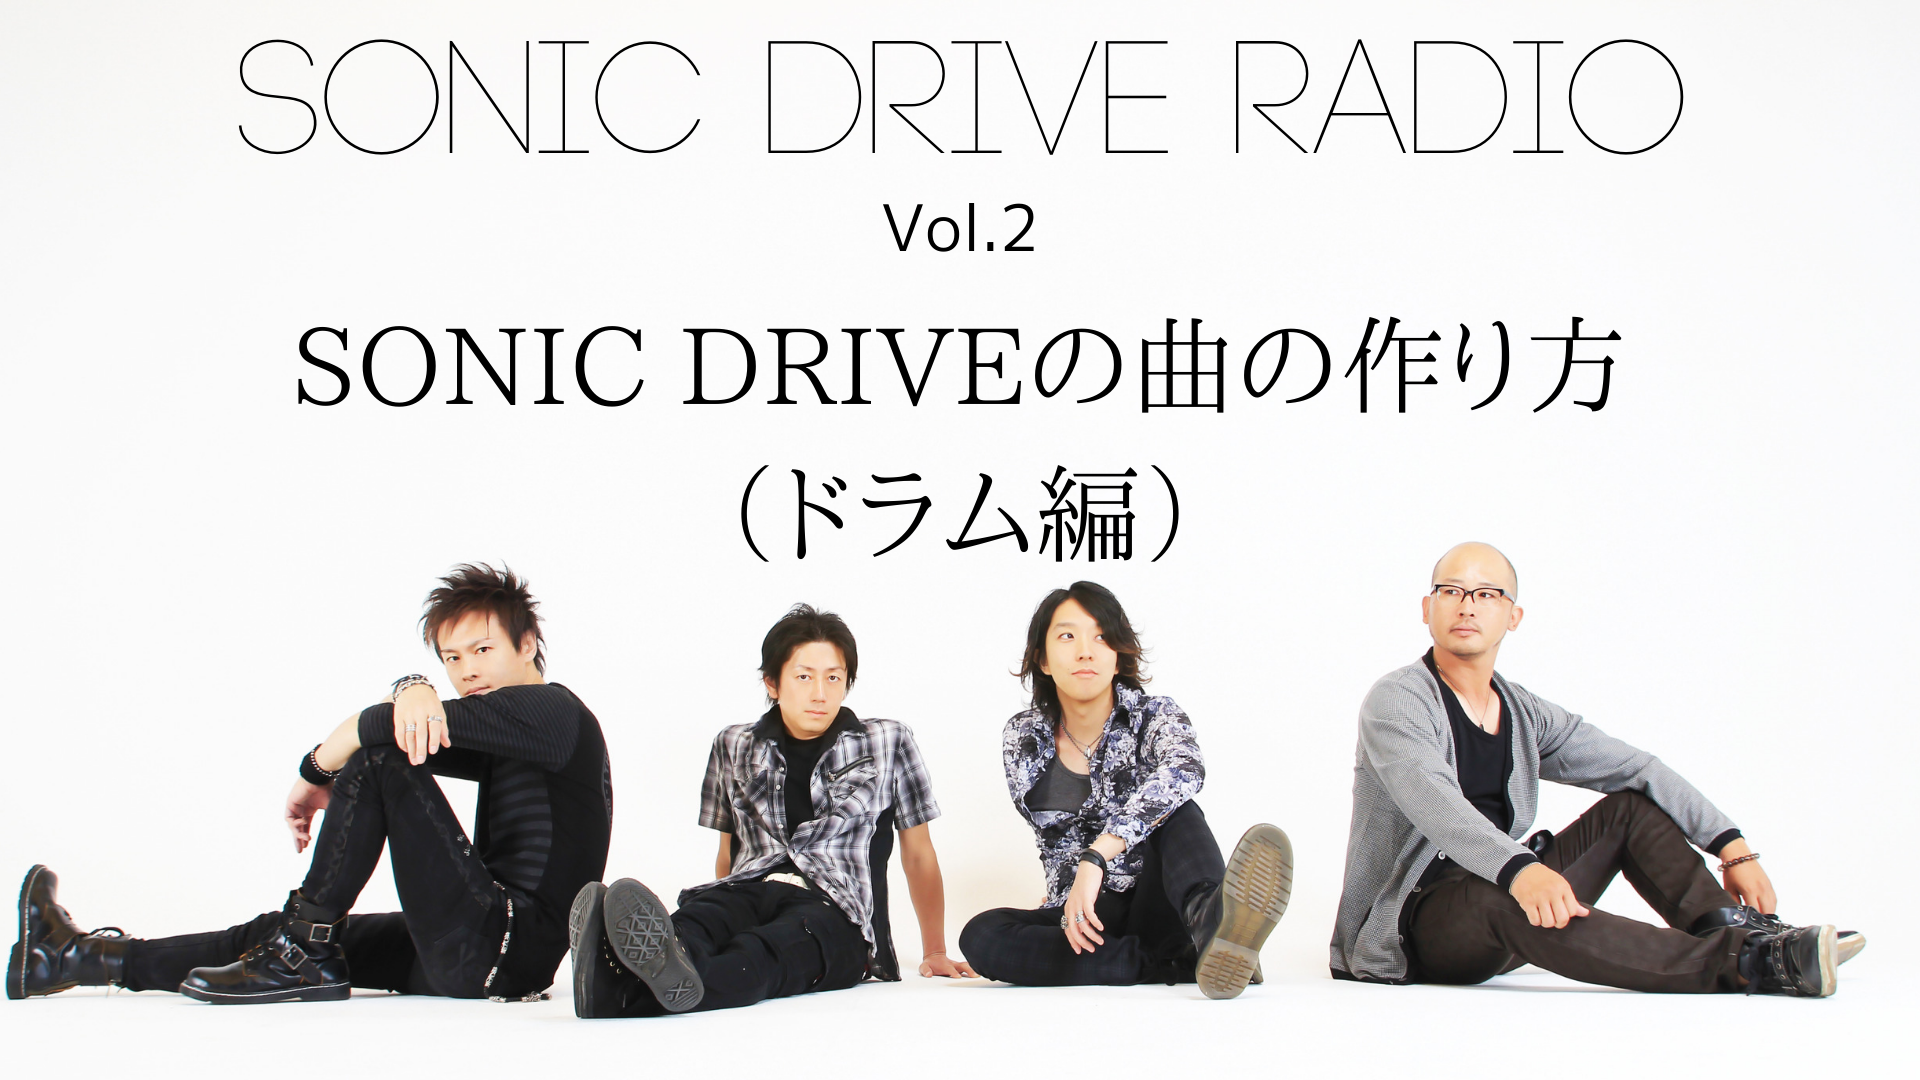 【SONIC DRIVE RADIO】 Vol.2「SONIC DRIVEの曲の作り方(ドラム編)」